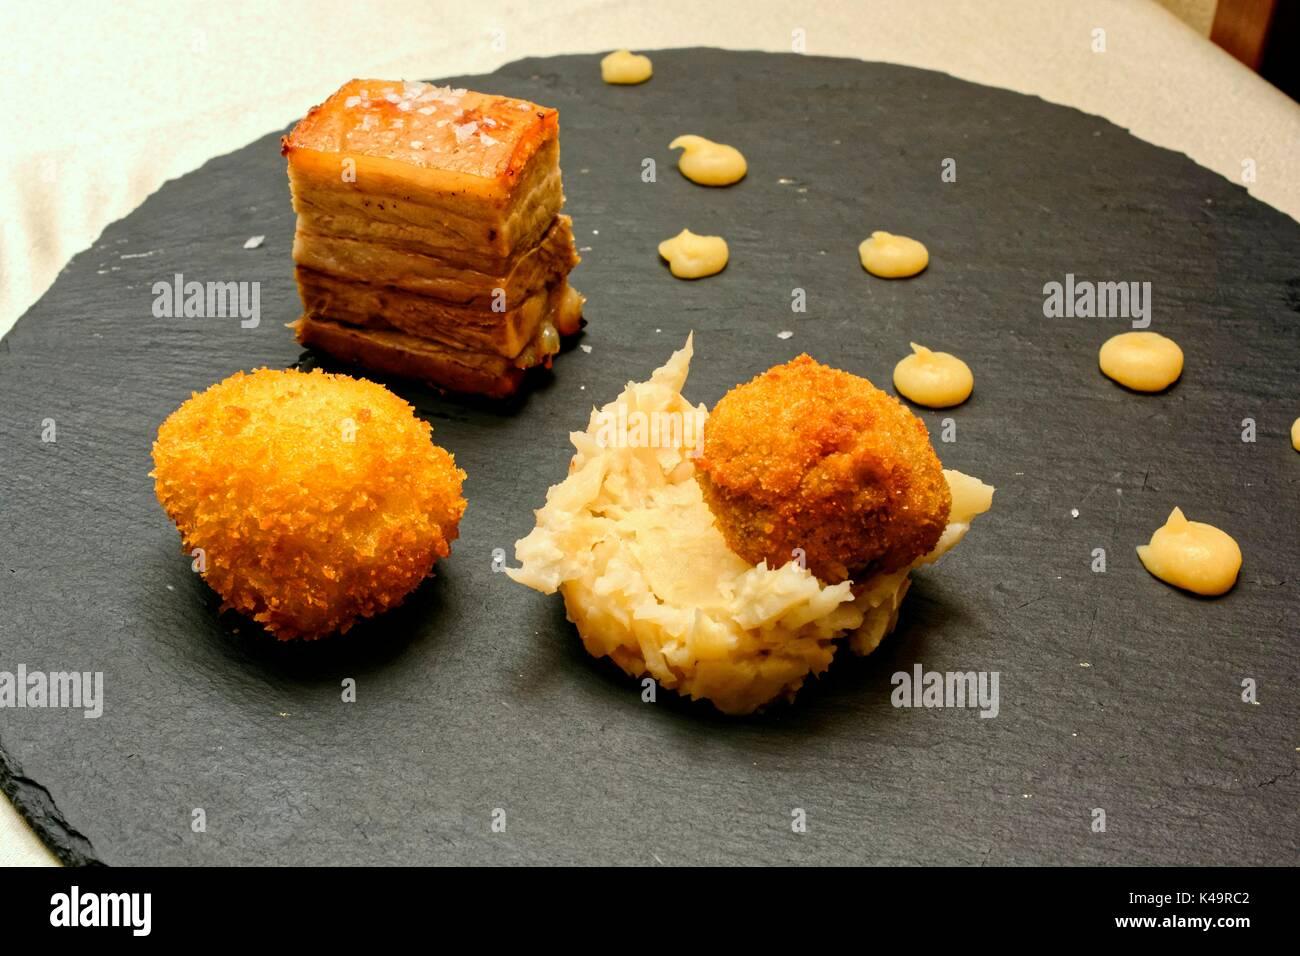 Fine Dining, Crispy Pork Belly Seasoned With Quince Cream, Pureed Parsnake, Breaded Potato Dumpling And Pork Paste - Stock Image